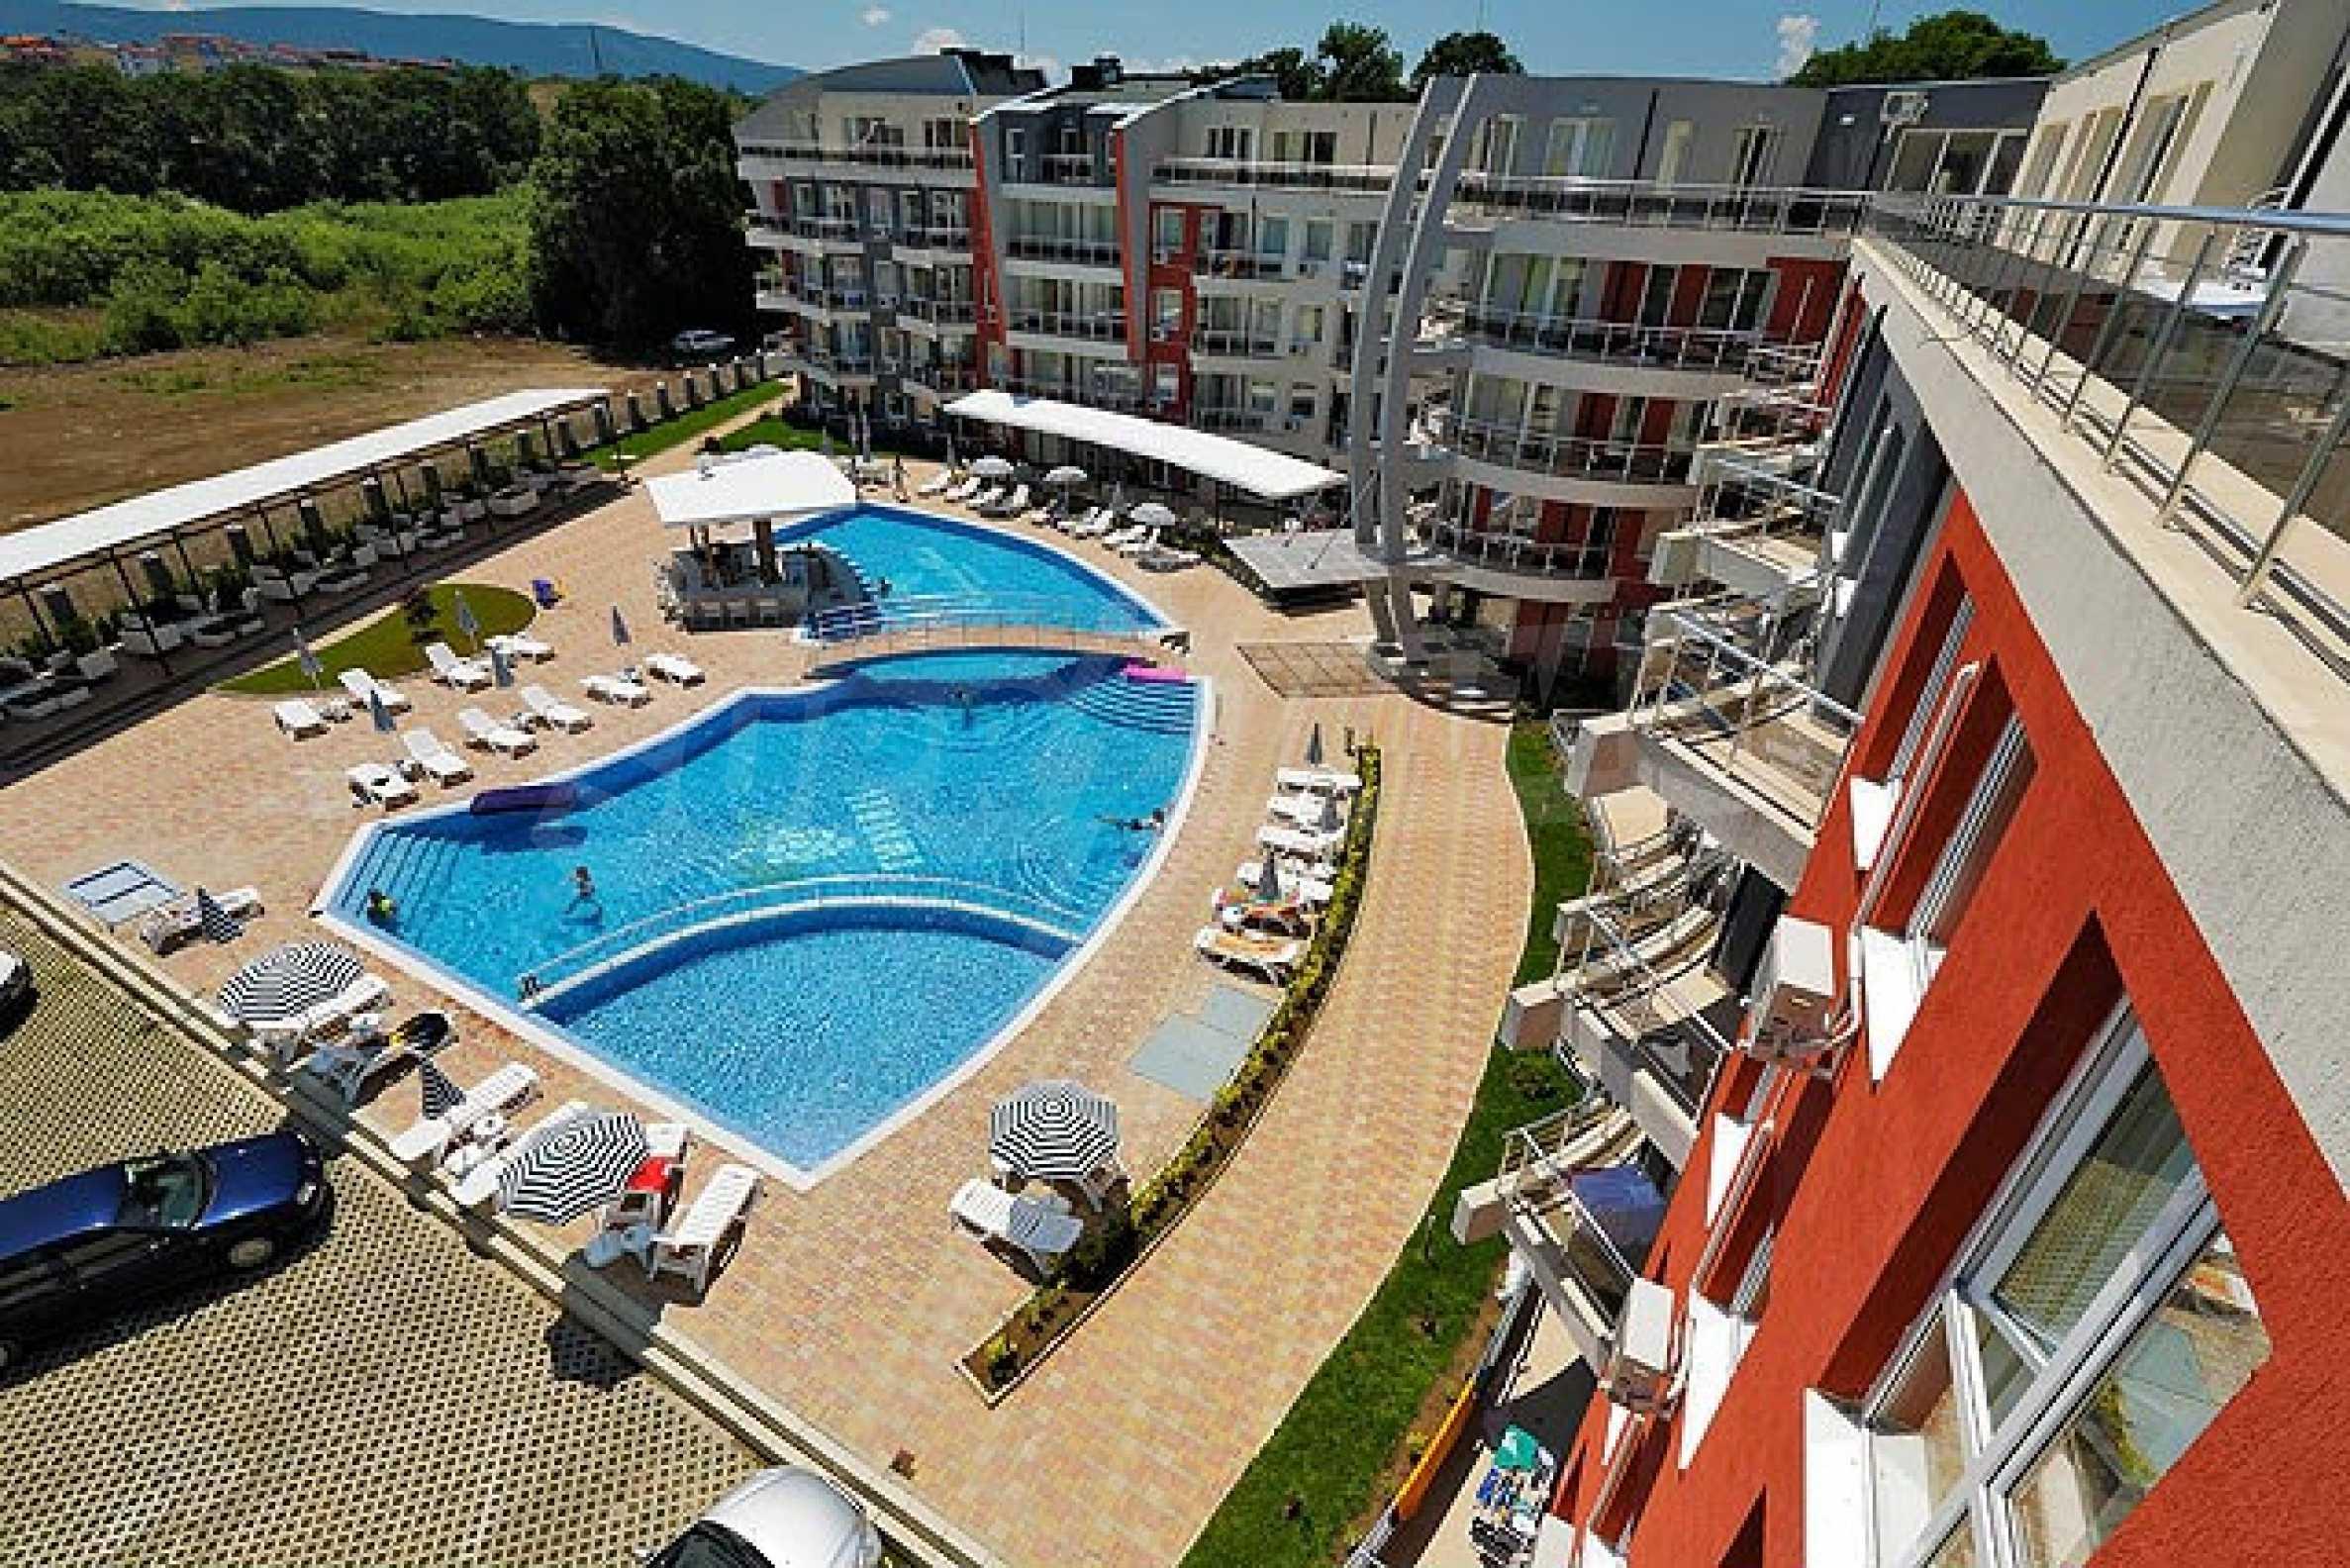 Трехкомнатный апартамент на продажу в комплексе Emberli в курорте Лозенец 7